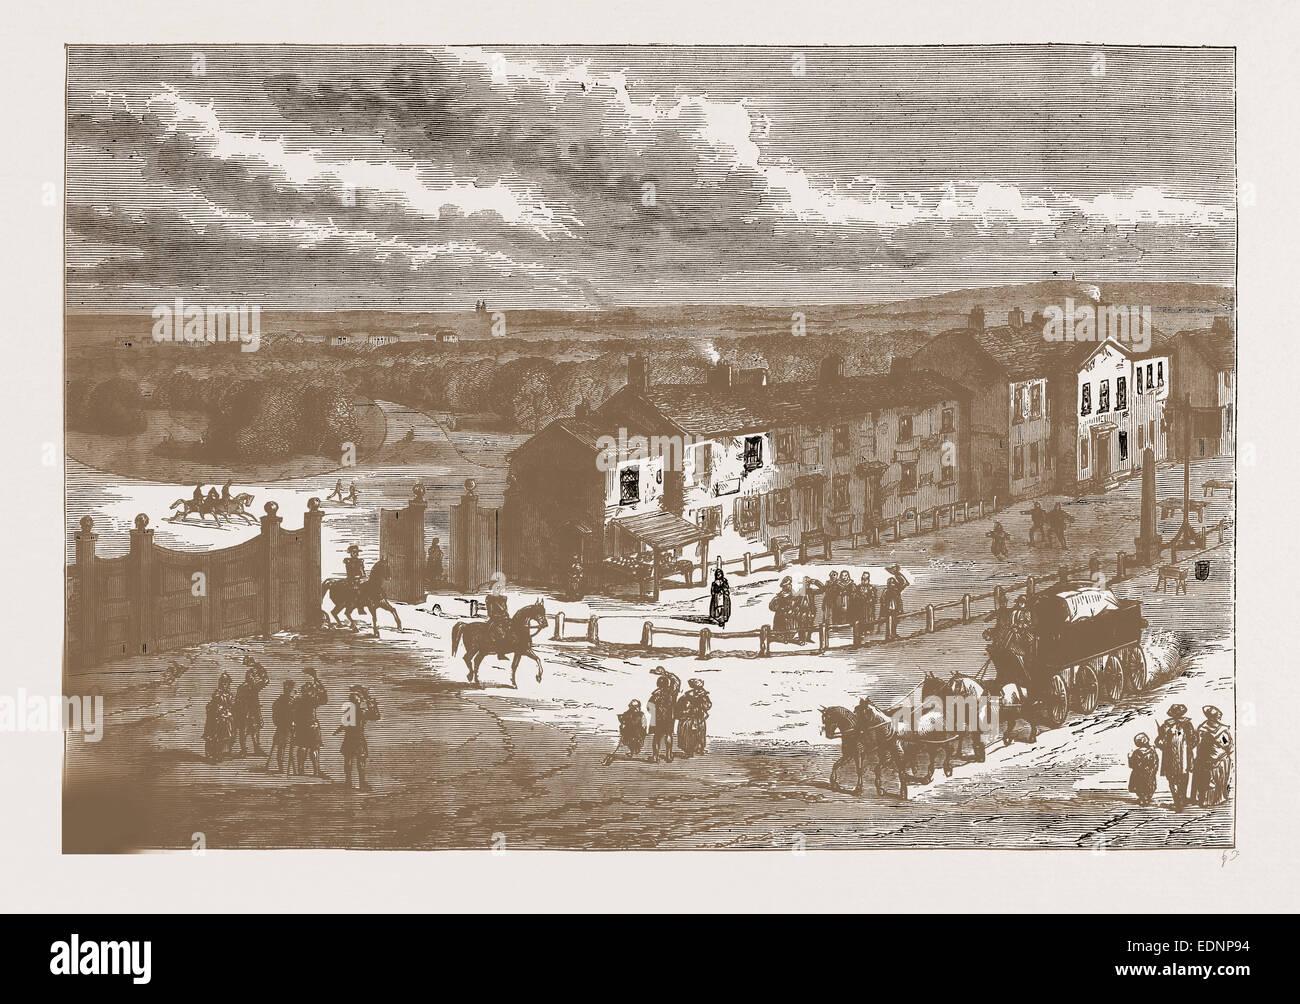 HYDE PARK CORNER 1N I750. London, UK, 19th century engraving - Stock Image